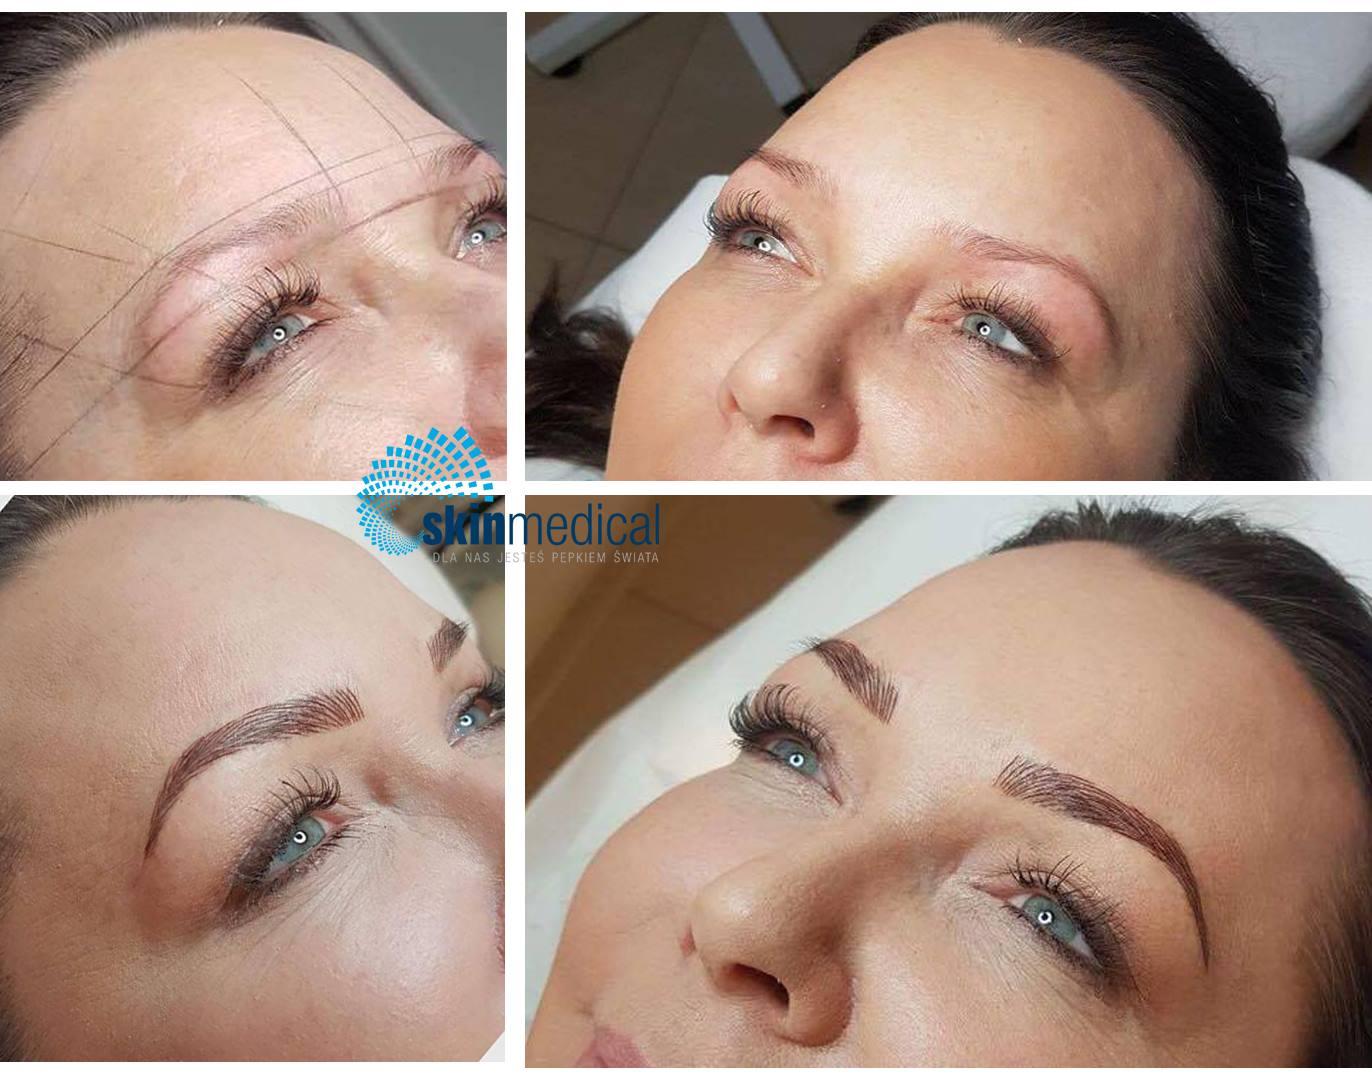 Skinmedical Microblanding Makijaż Permanentny Brwi Metodą